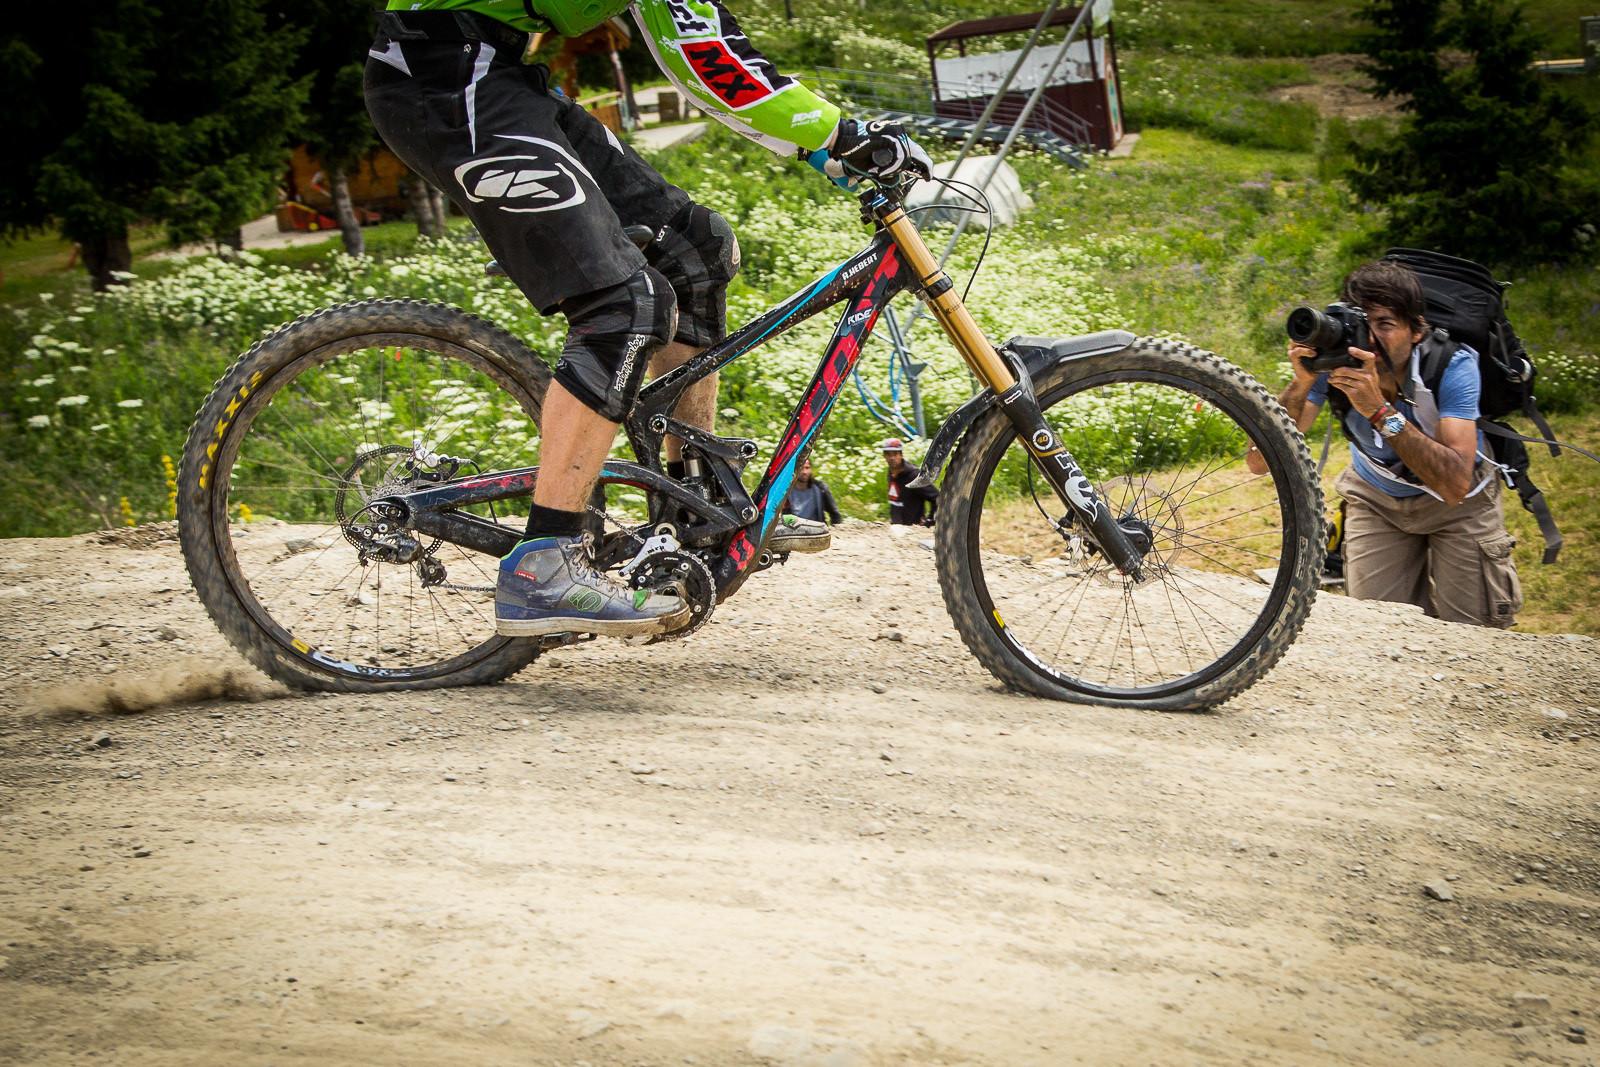 G-Out Project Crankworx L2A - Scott Gambler Massive Squish! - G-Out Project: Crankworx L2A Air DH - Mountain Biking Pictures - Vital MTB